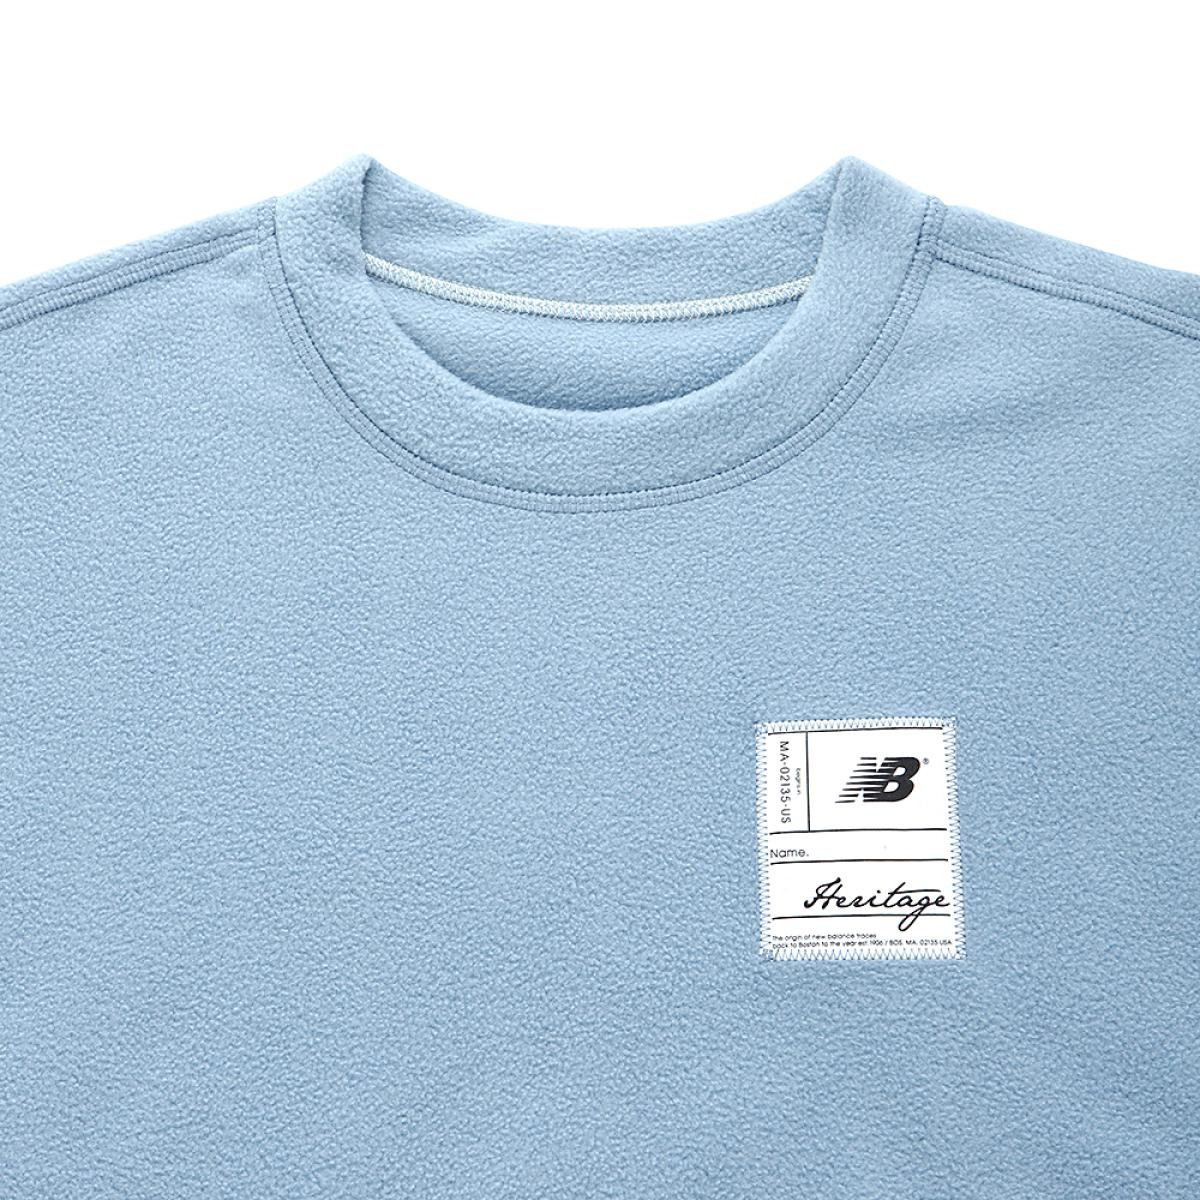 (51)Light Blue